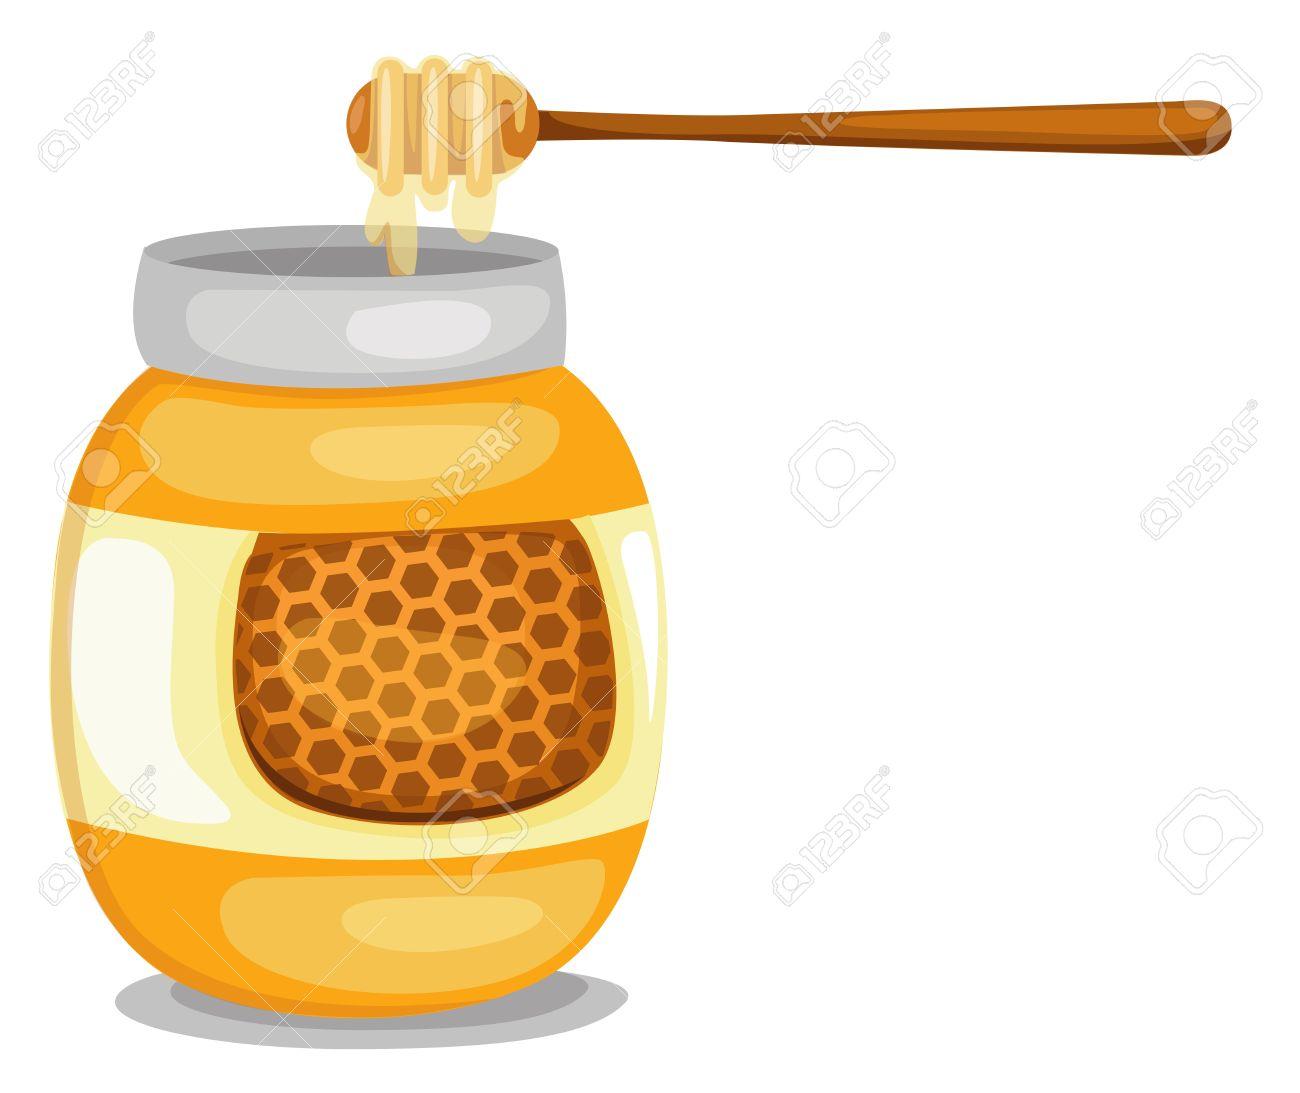 Honey clipart vector #8